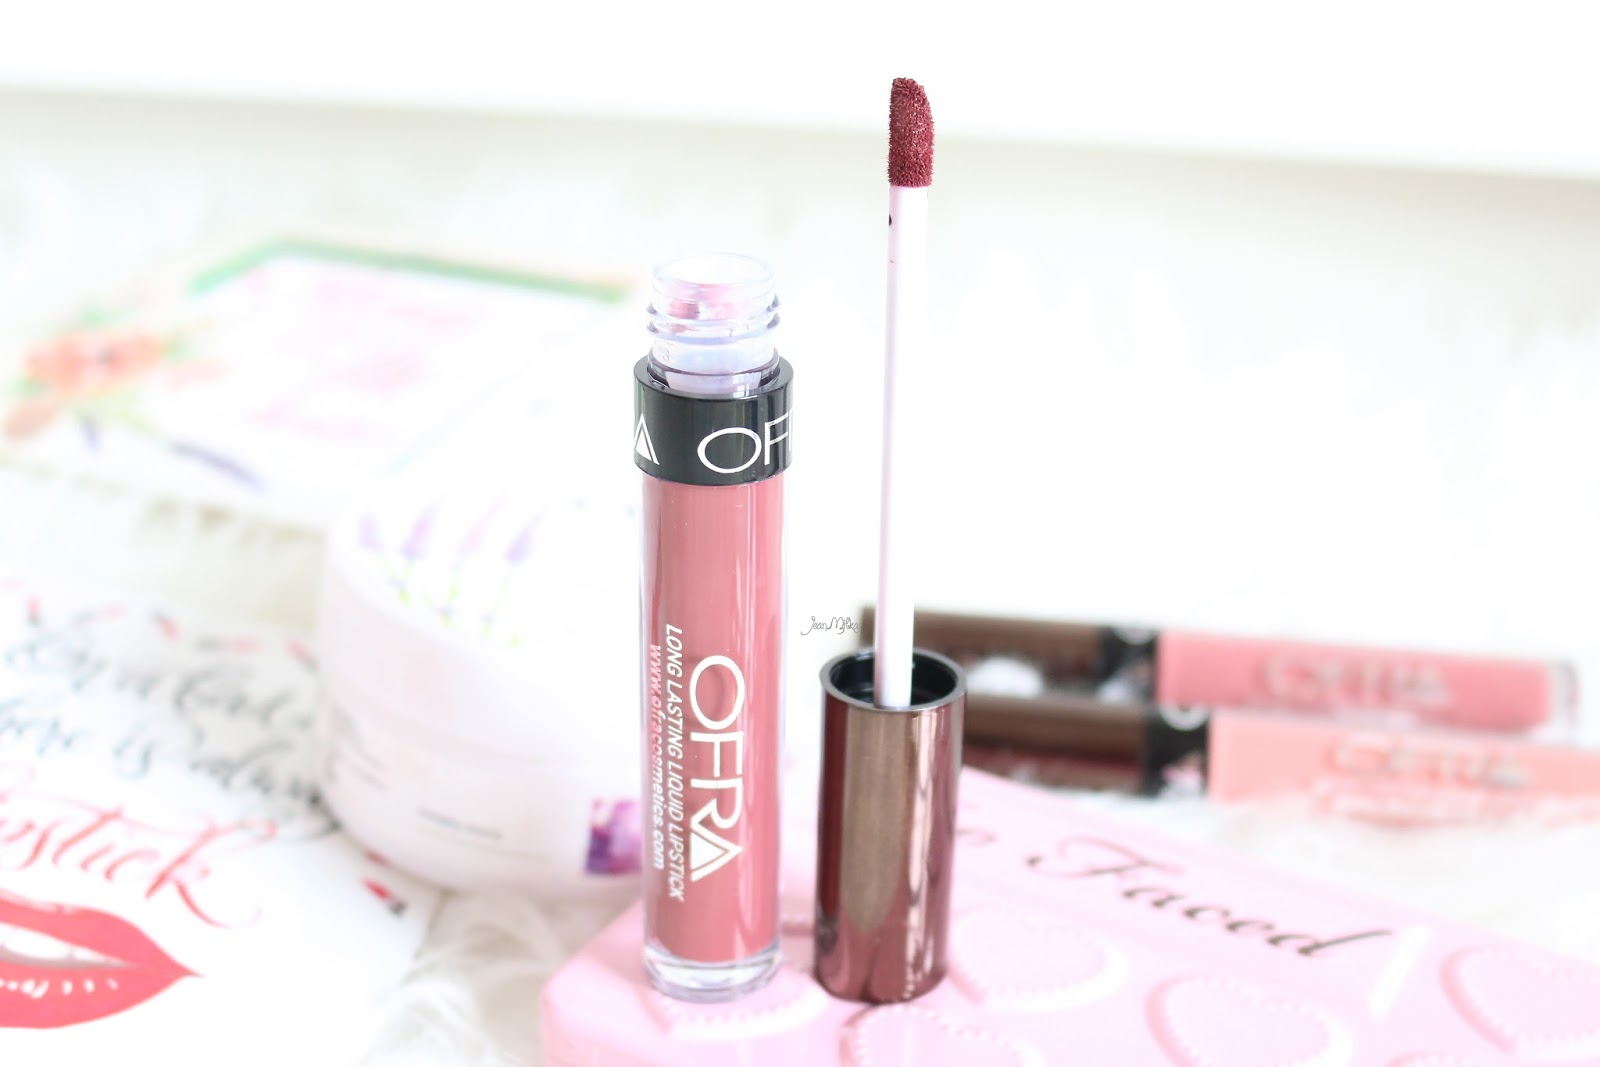 ofra x manny, ofraxmanny, ofra manny, ofra x manny mua, ofra, ofra cosmetics, ofra liquid lipstick, liquid lipstick, product review, swatches, beauty blog